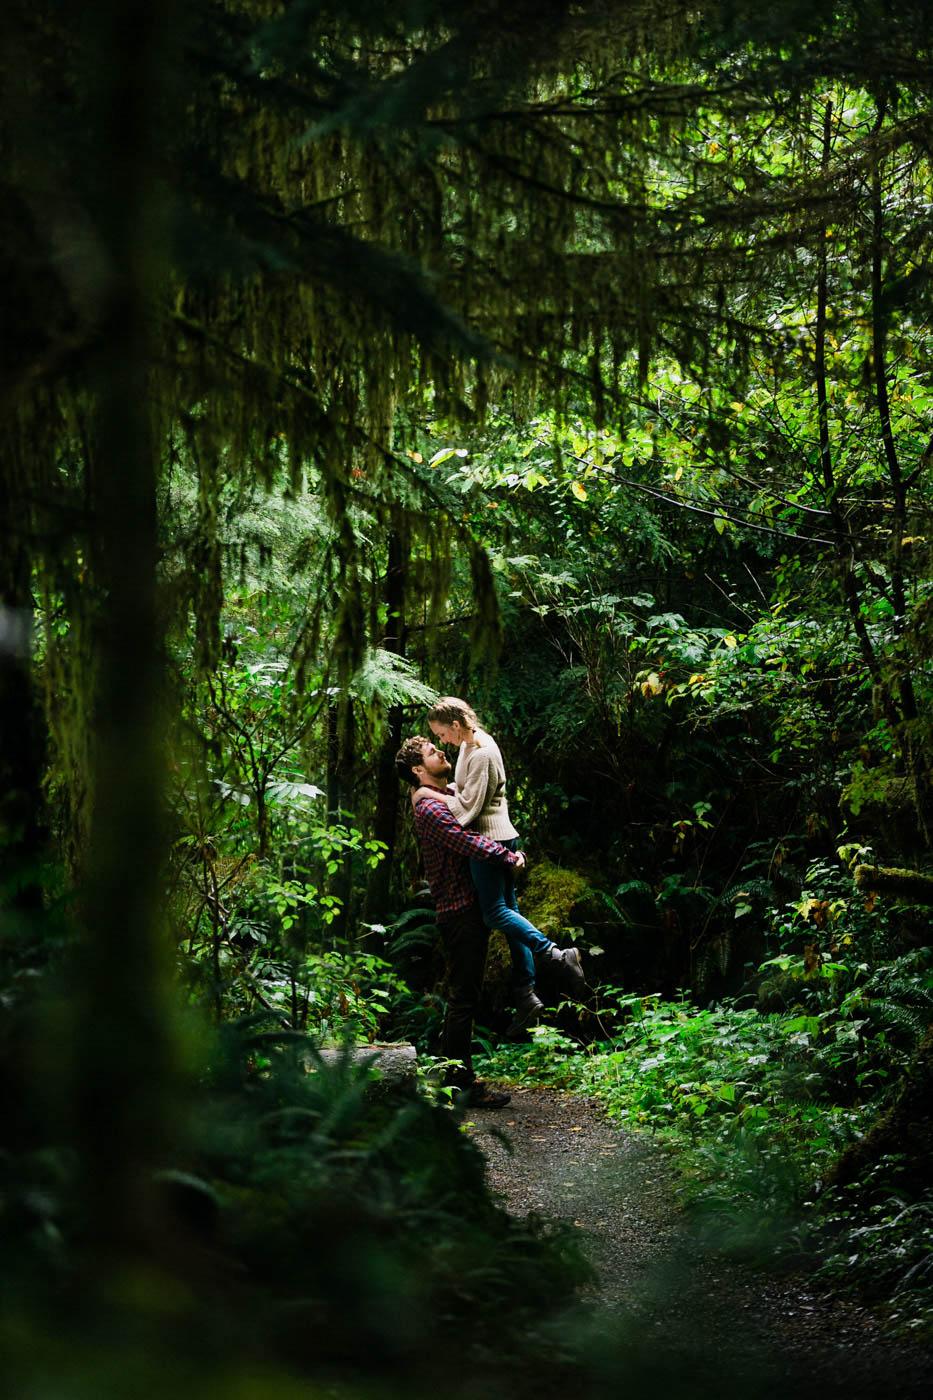 87_LR-Olympic_National_Forest_Washington_Engagment_Photography_-Edit.jpg